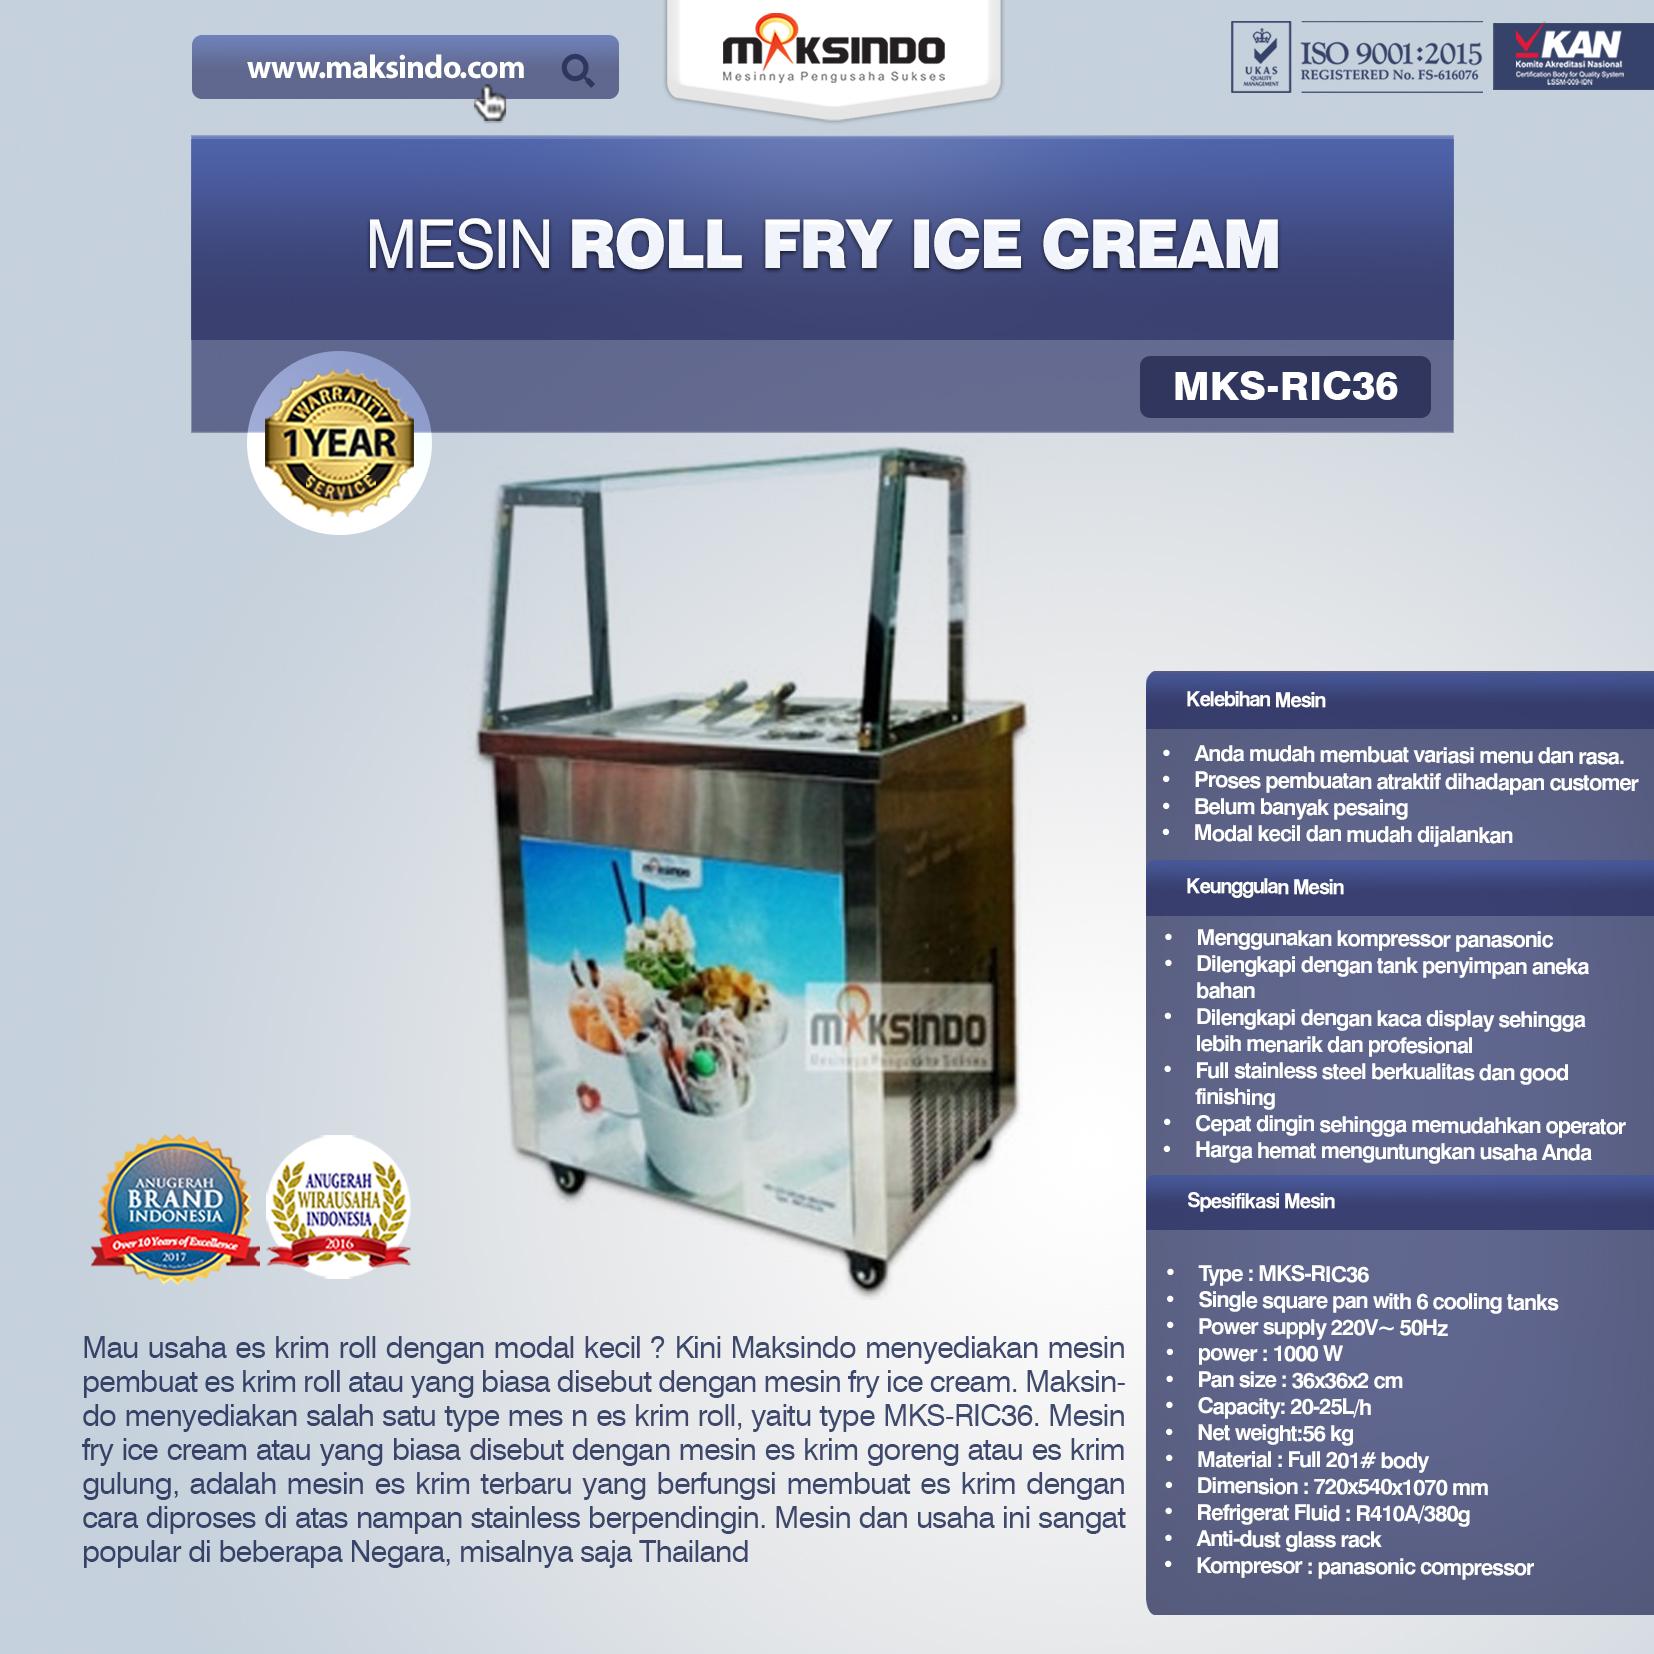 Jual Mesin Roll Fry Ice Cream (RIC36) di Bekasi